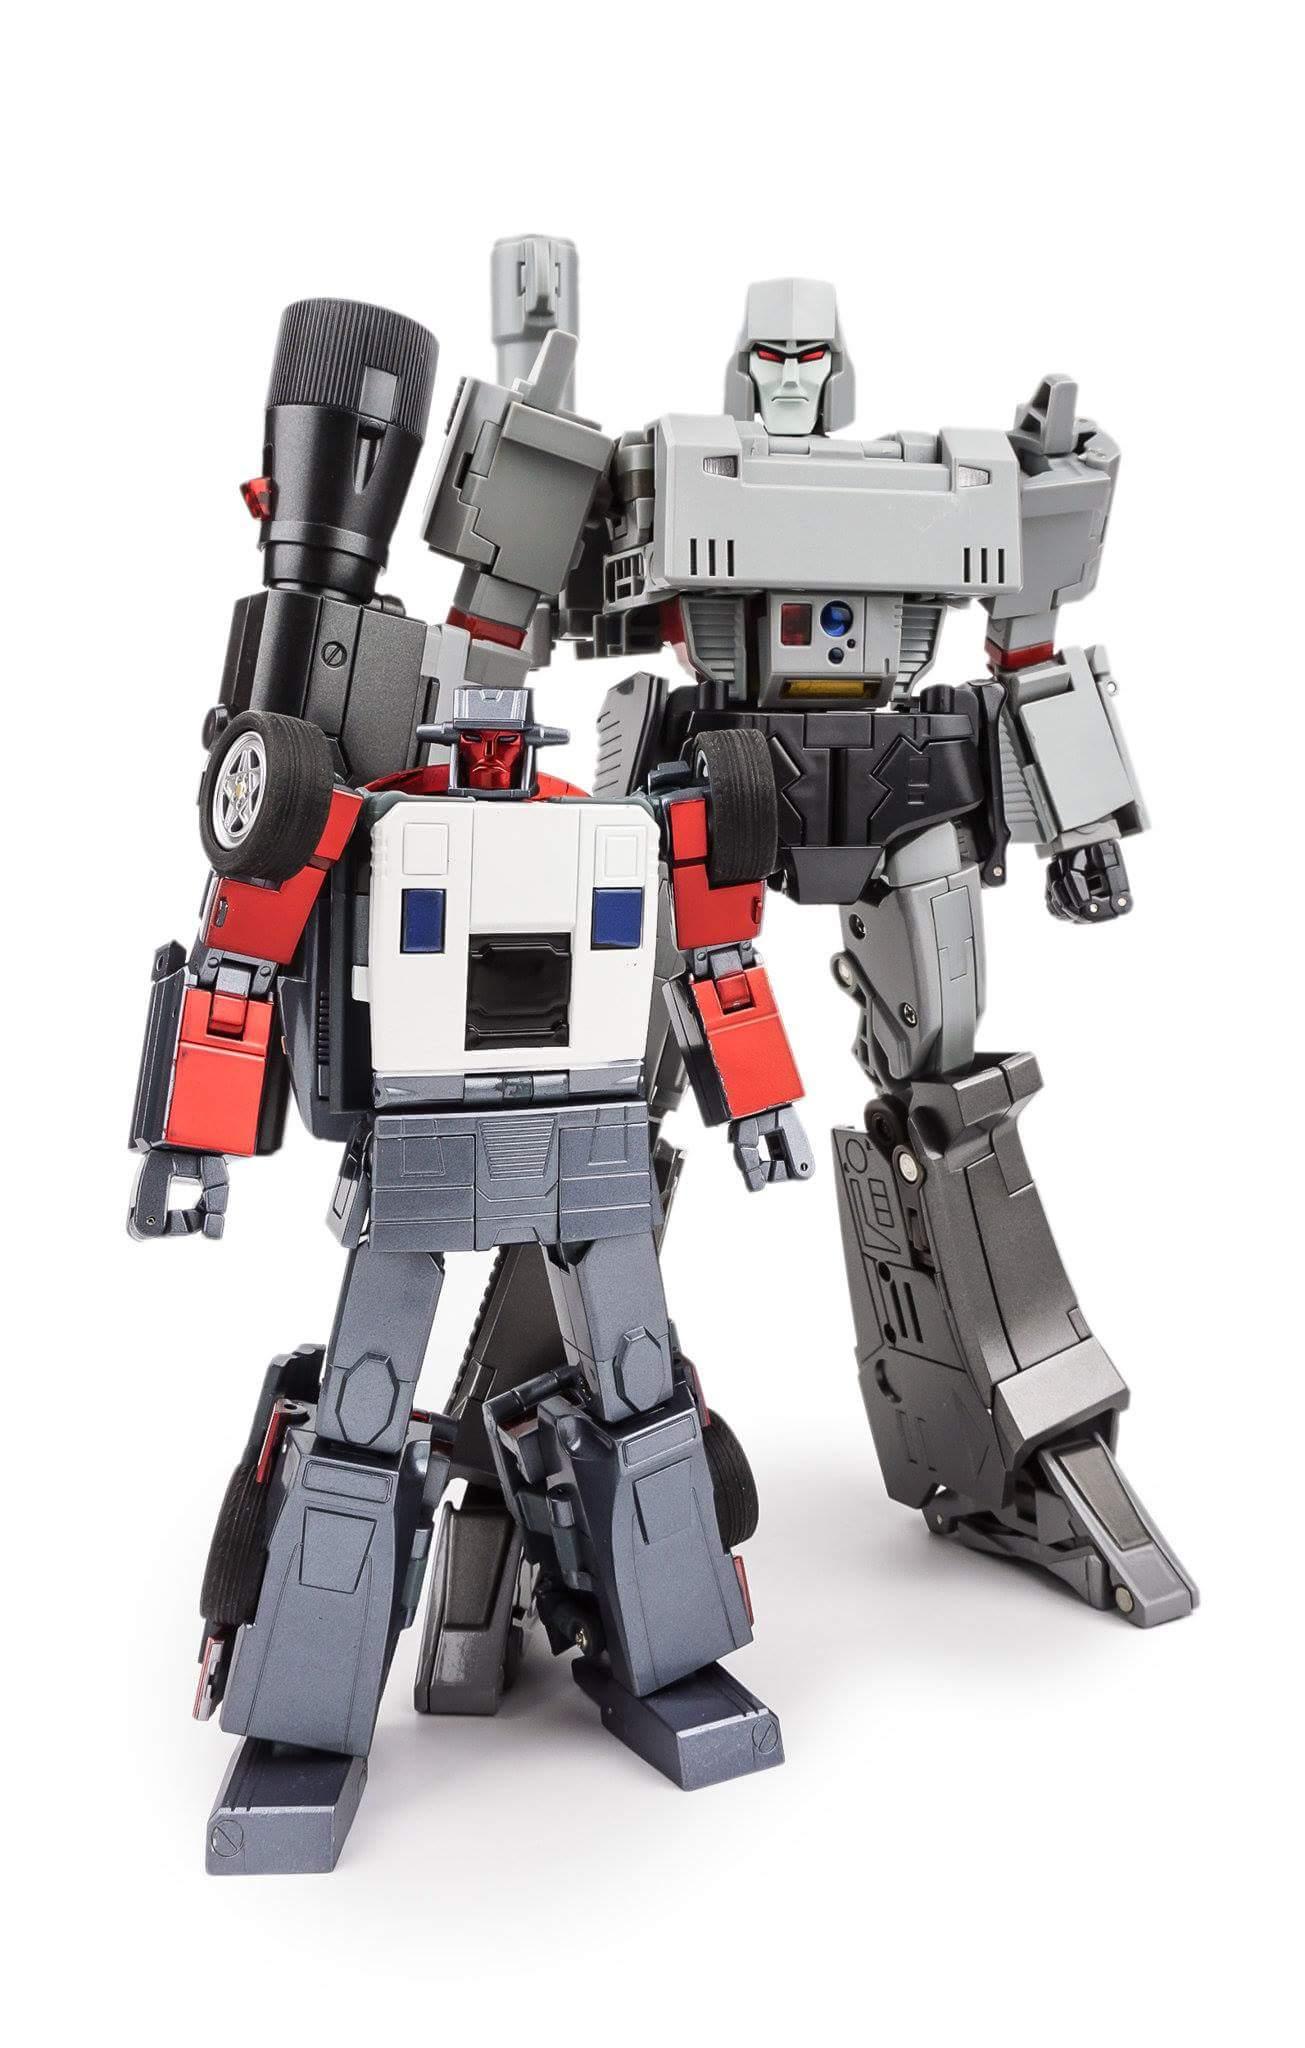 [X-Transbots] Produit Tiers - Jouets Berserkars forme Monolith (MX-XIII à MX-VII) - aka Stunticons forme Menasor/Menaseur - Page 2 5fLOhbWR_o